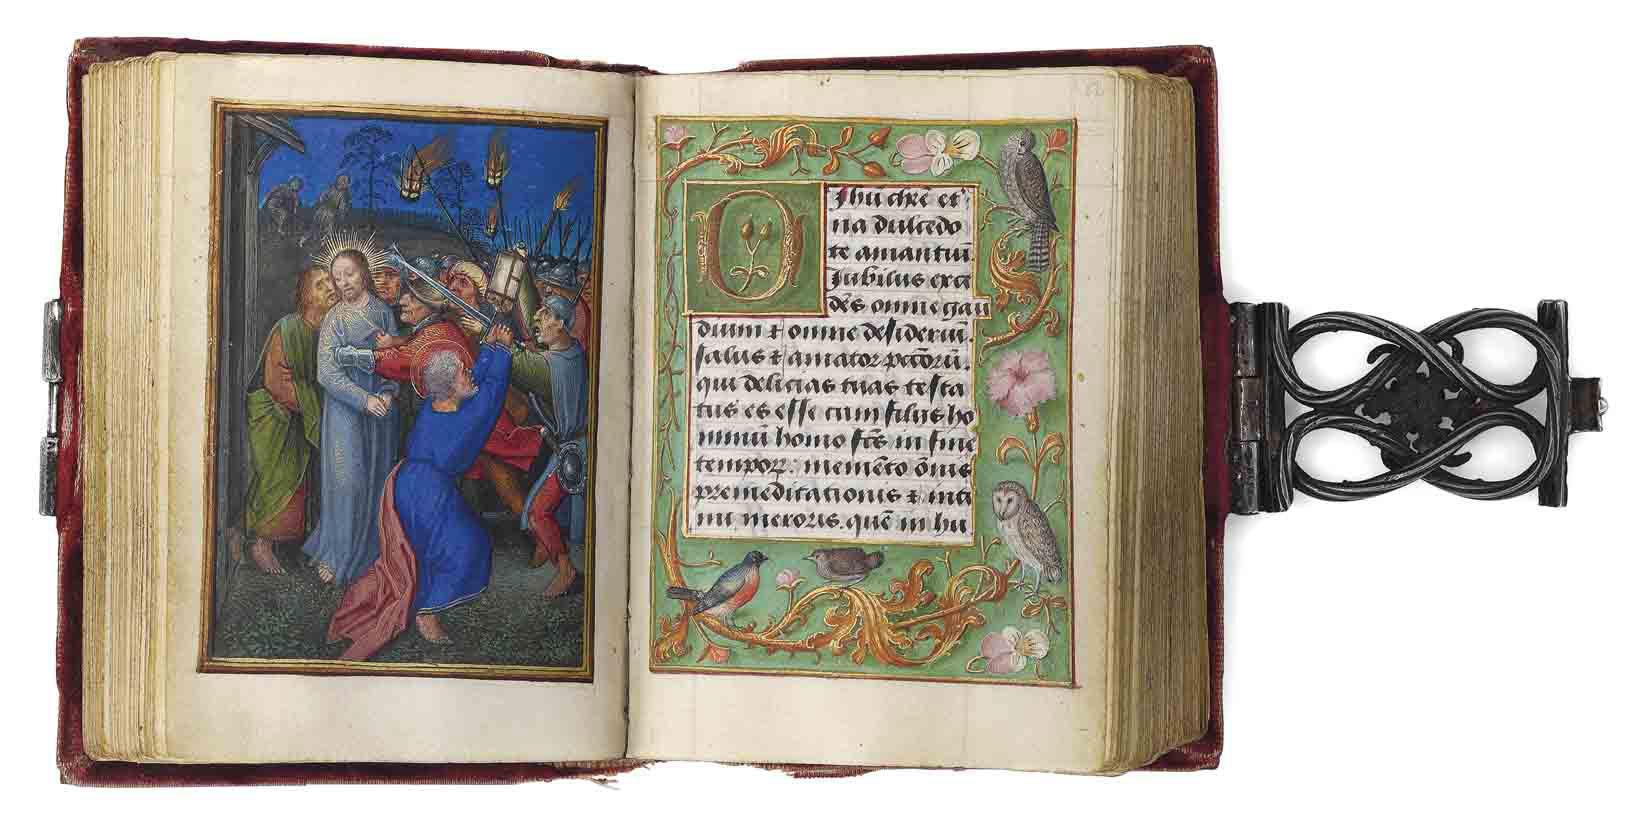 THE IMHOF PRAYERBOOK, illuminated by SIMON BENING, in Latin and Dutch, ILLUMINATED MANUSCRIPT ON VELLUM